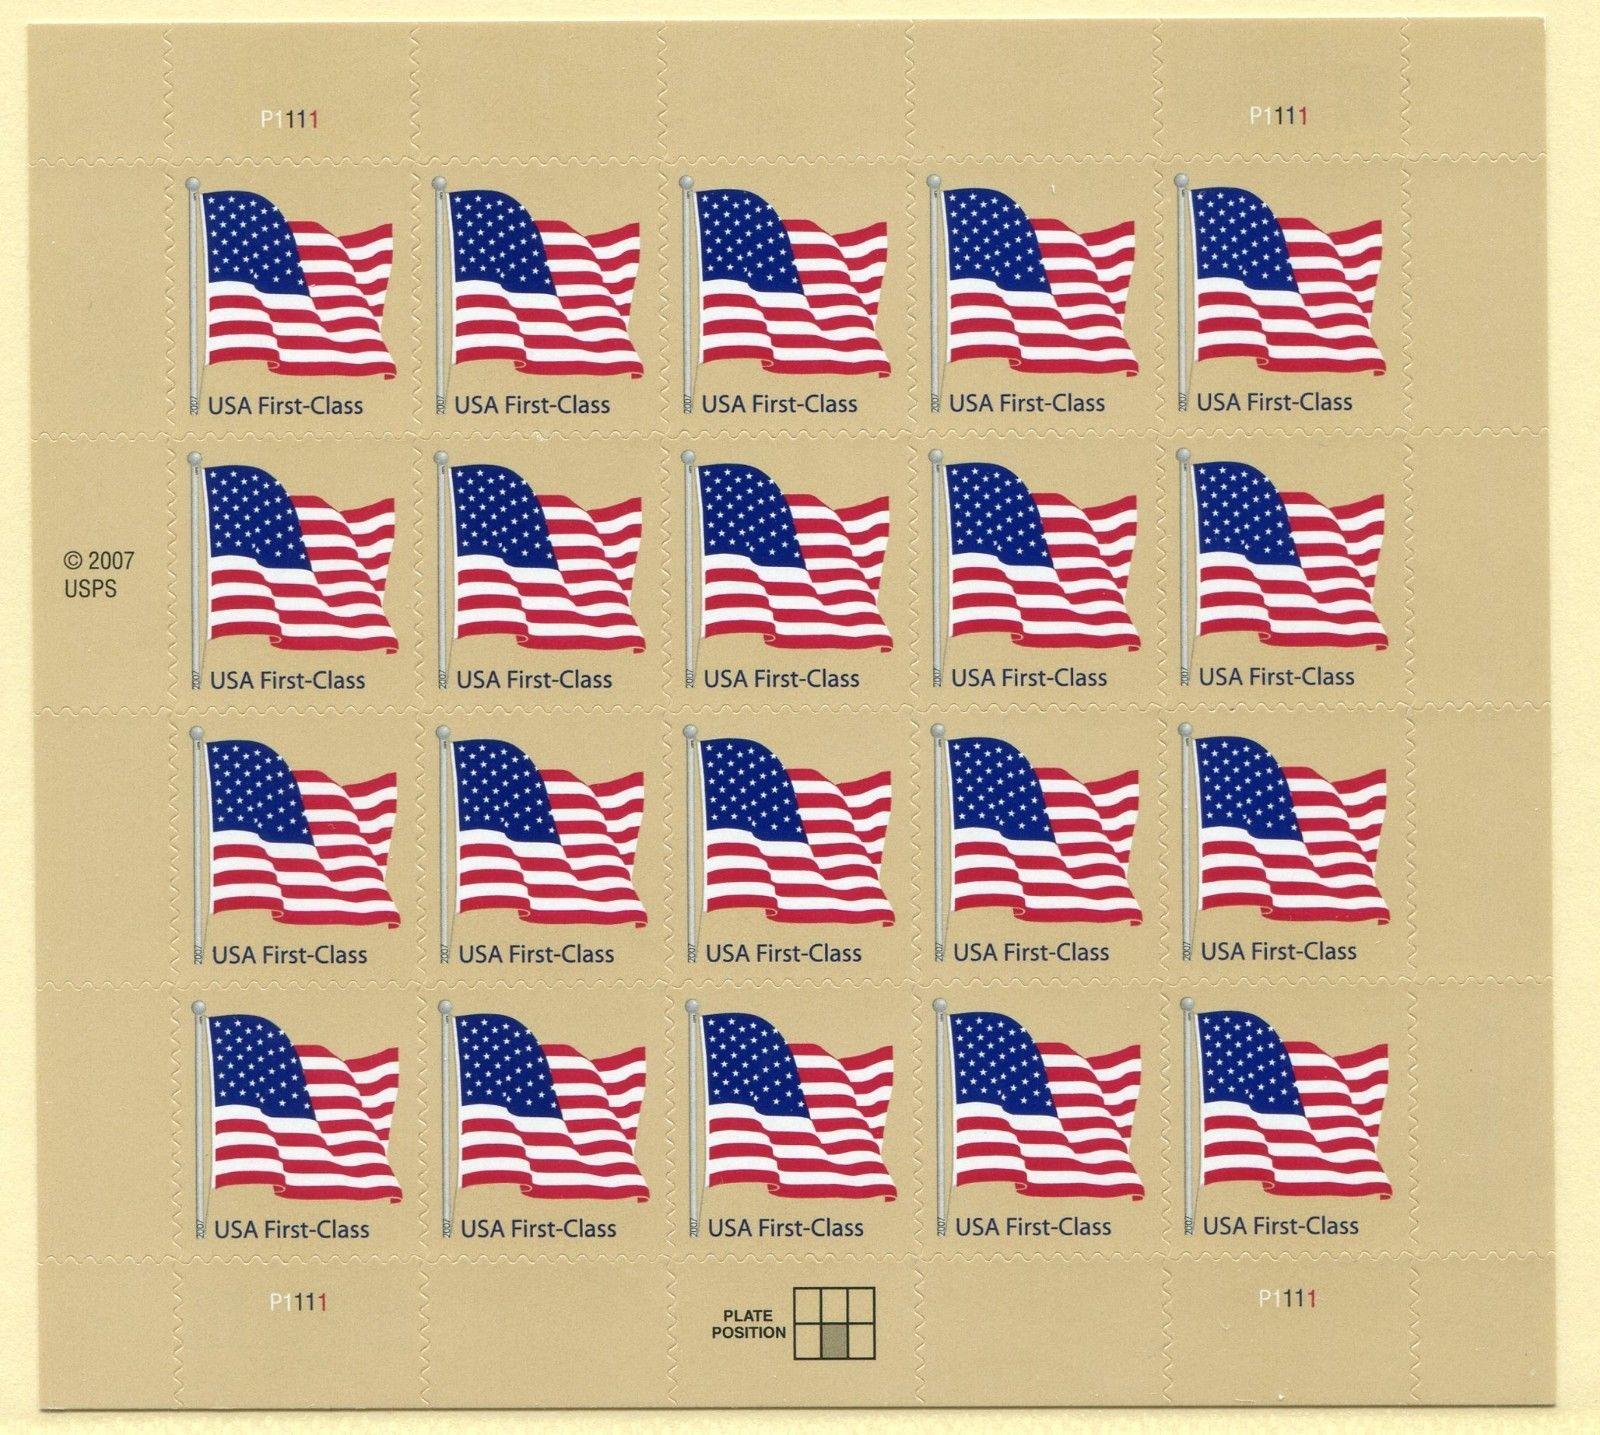 US Scott 4130 Flag Mint Sheet Of 20 41 Cent Stamps HipStamp